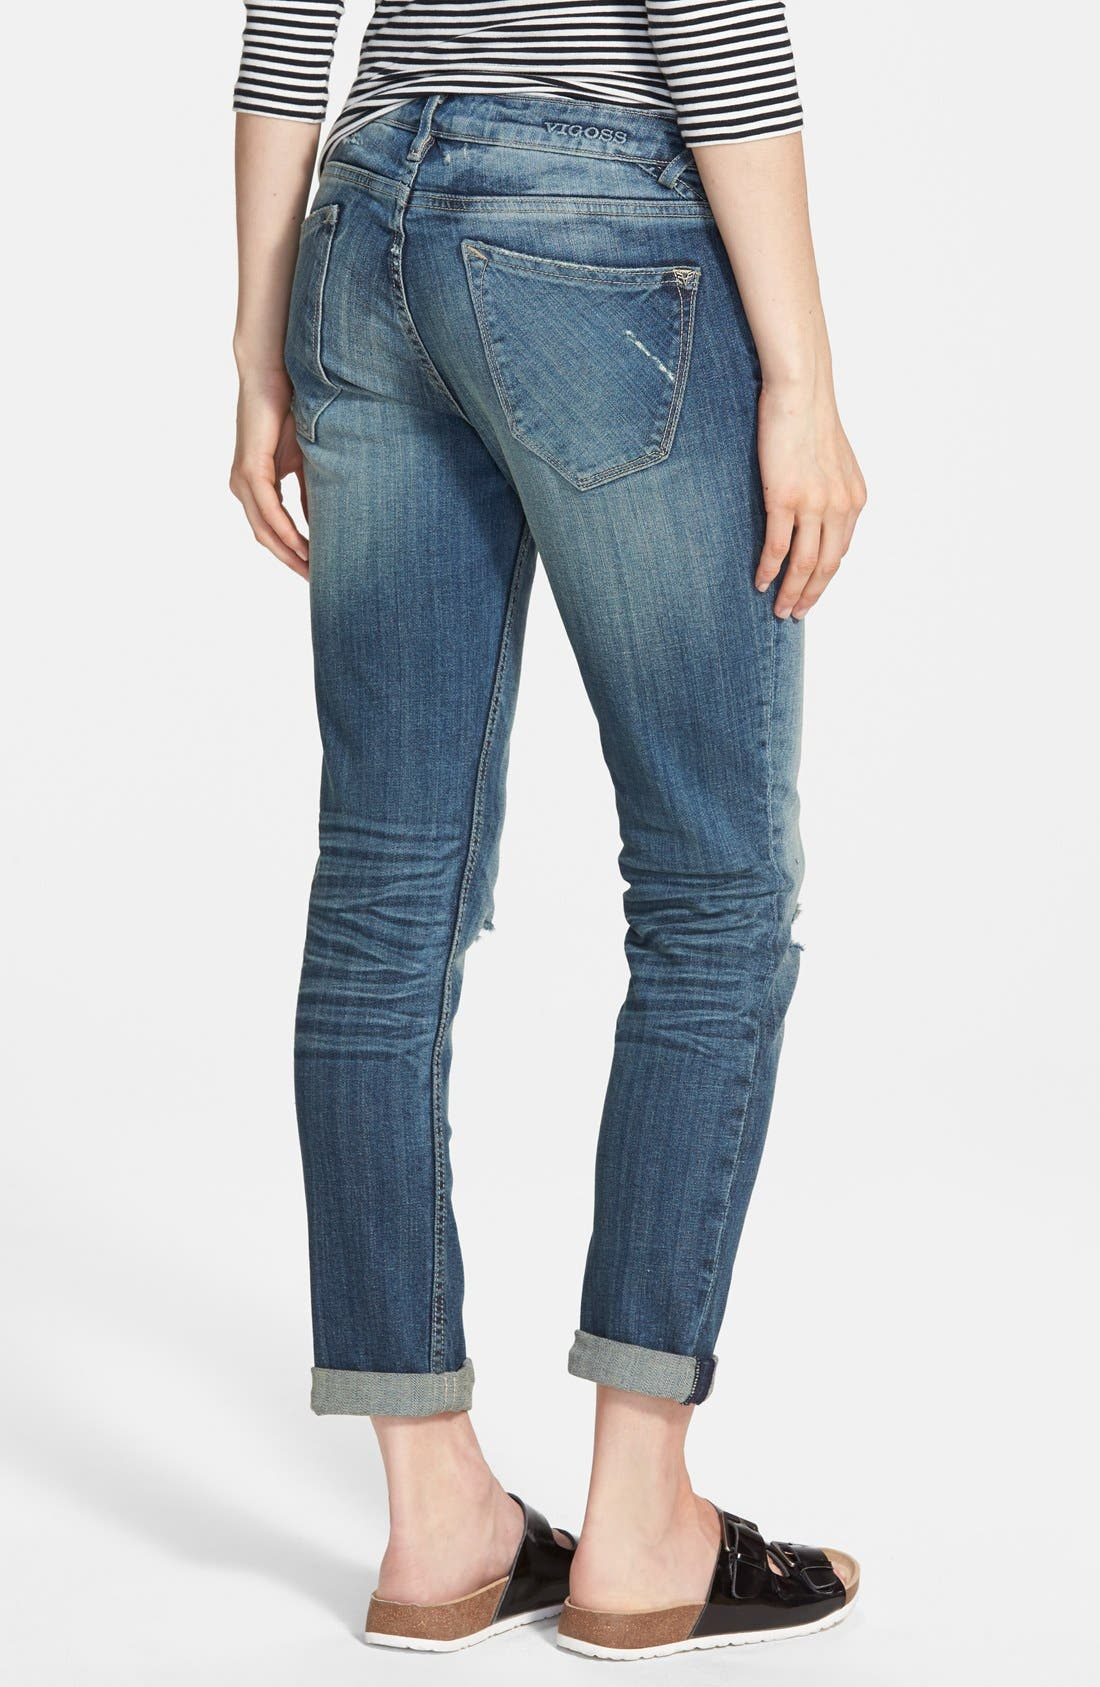 Alternate Image 2  - Vigoss 'Tomboy' Destroyed Skinny Jeans (Medium Wash)